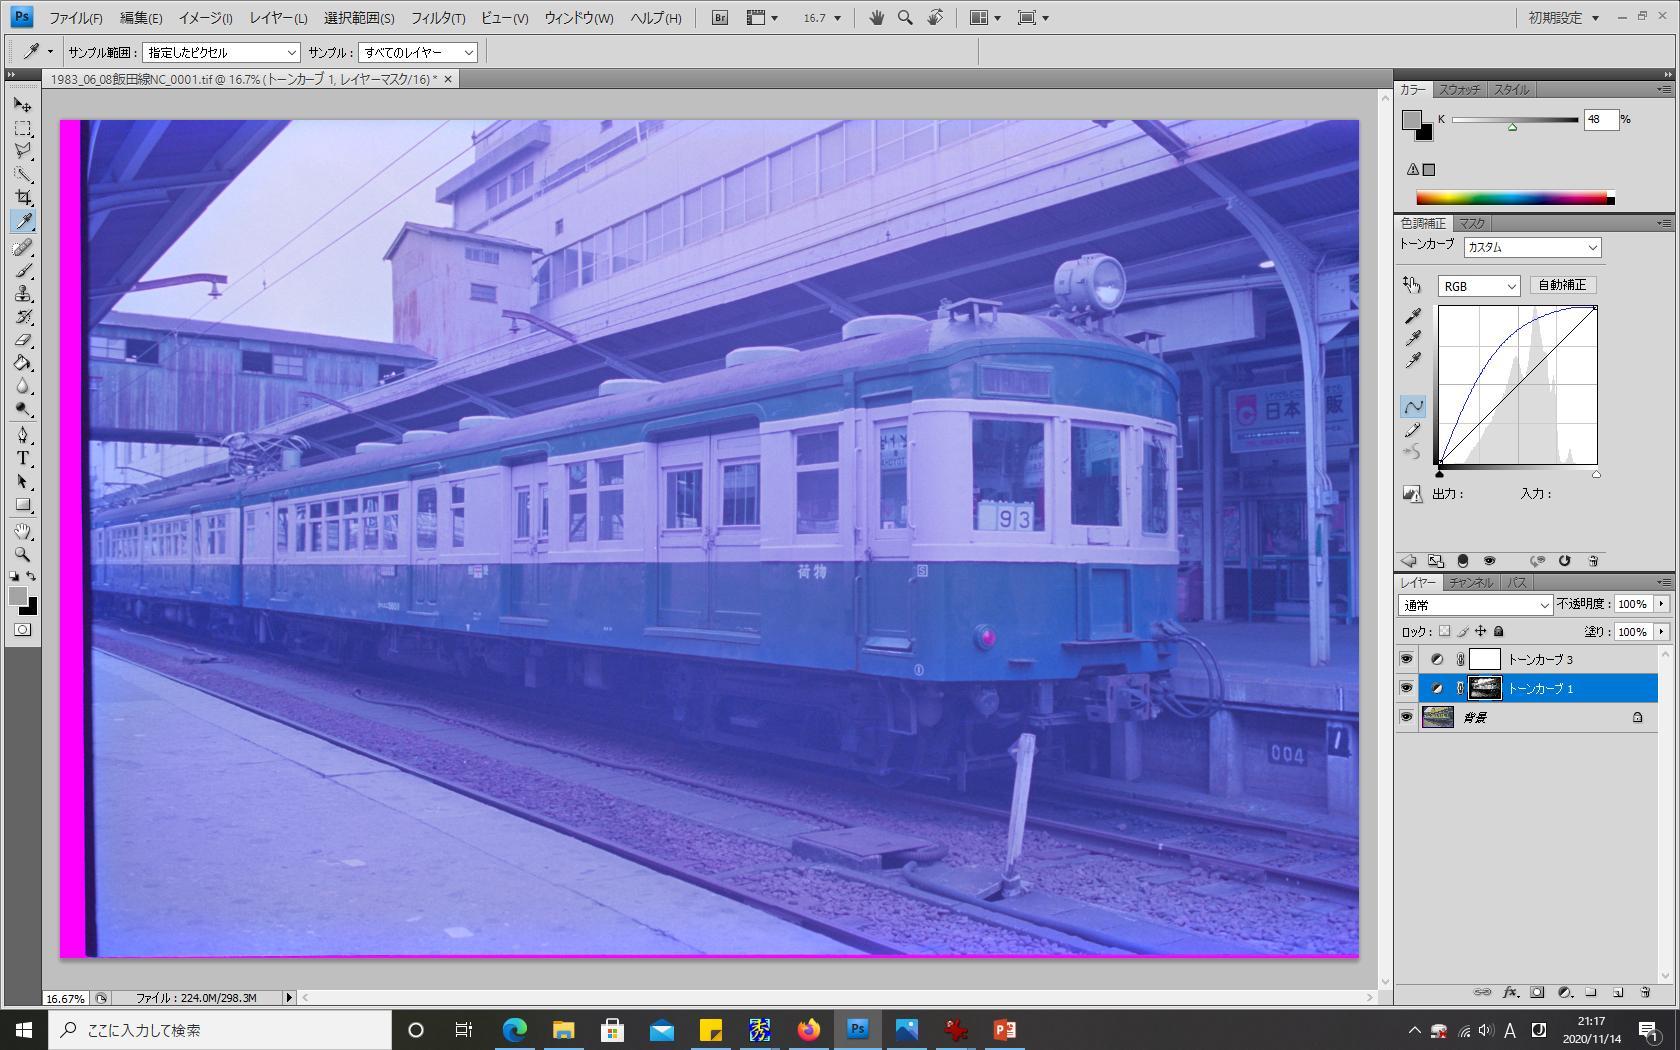 f:id:yasuo_ssi:20201114214613j:plain